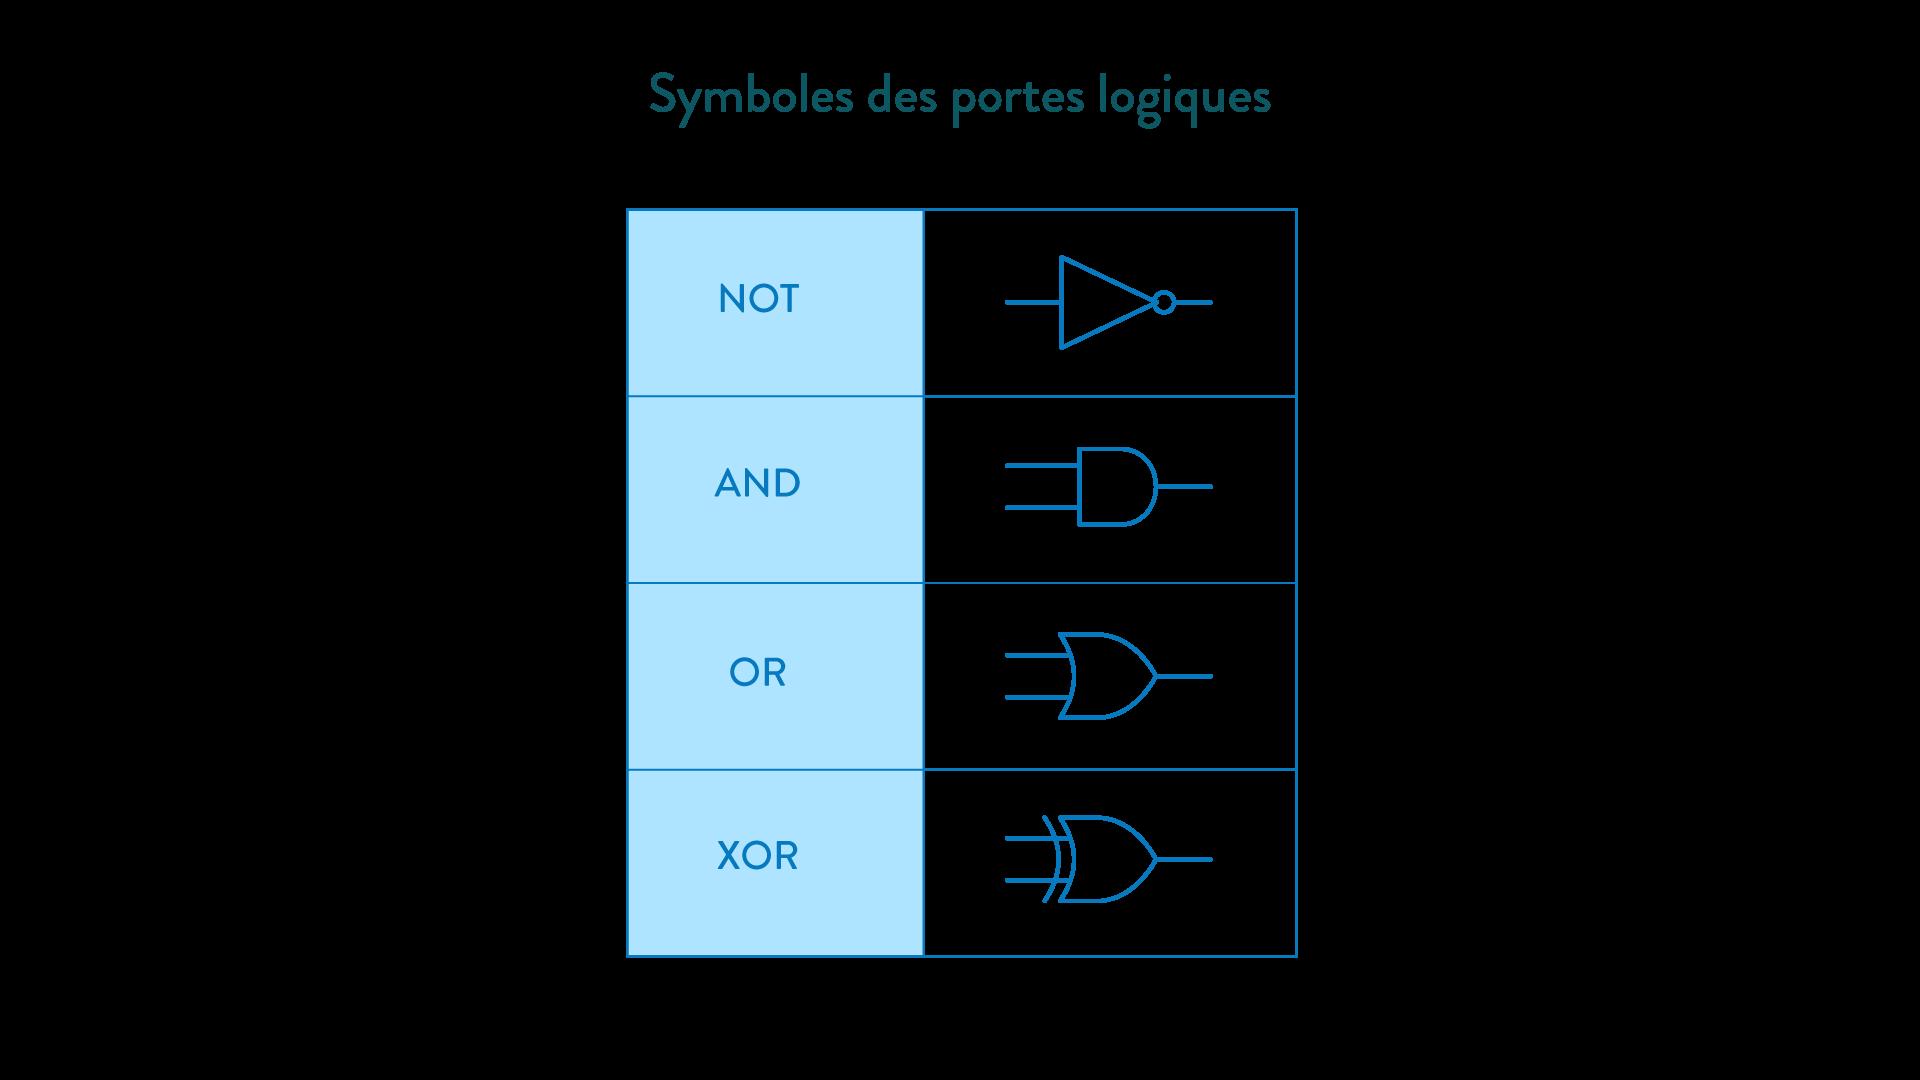 symboles des portes logiques